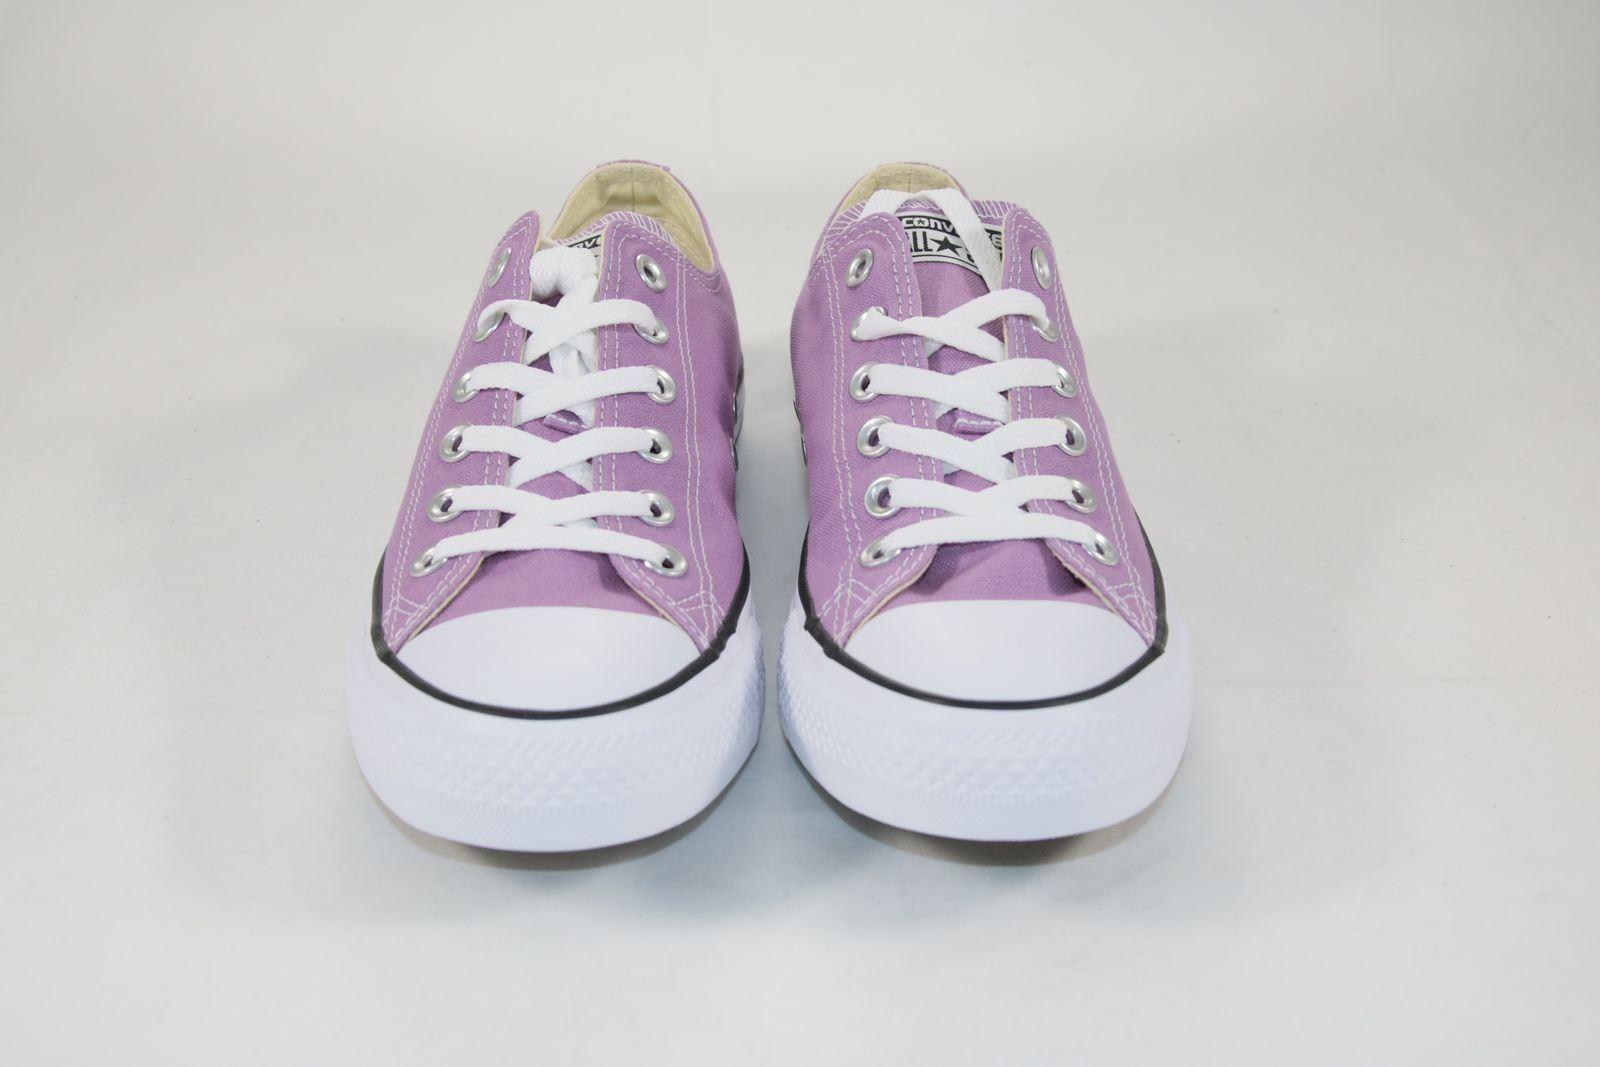 shoes CONVERSE All-Star (Cod. SKU223) TG.44,5 US 12,5 tela shoestte pink basse